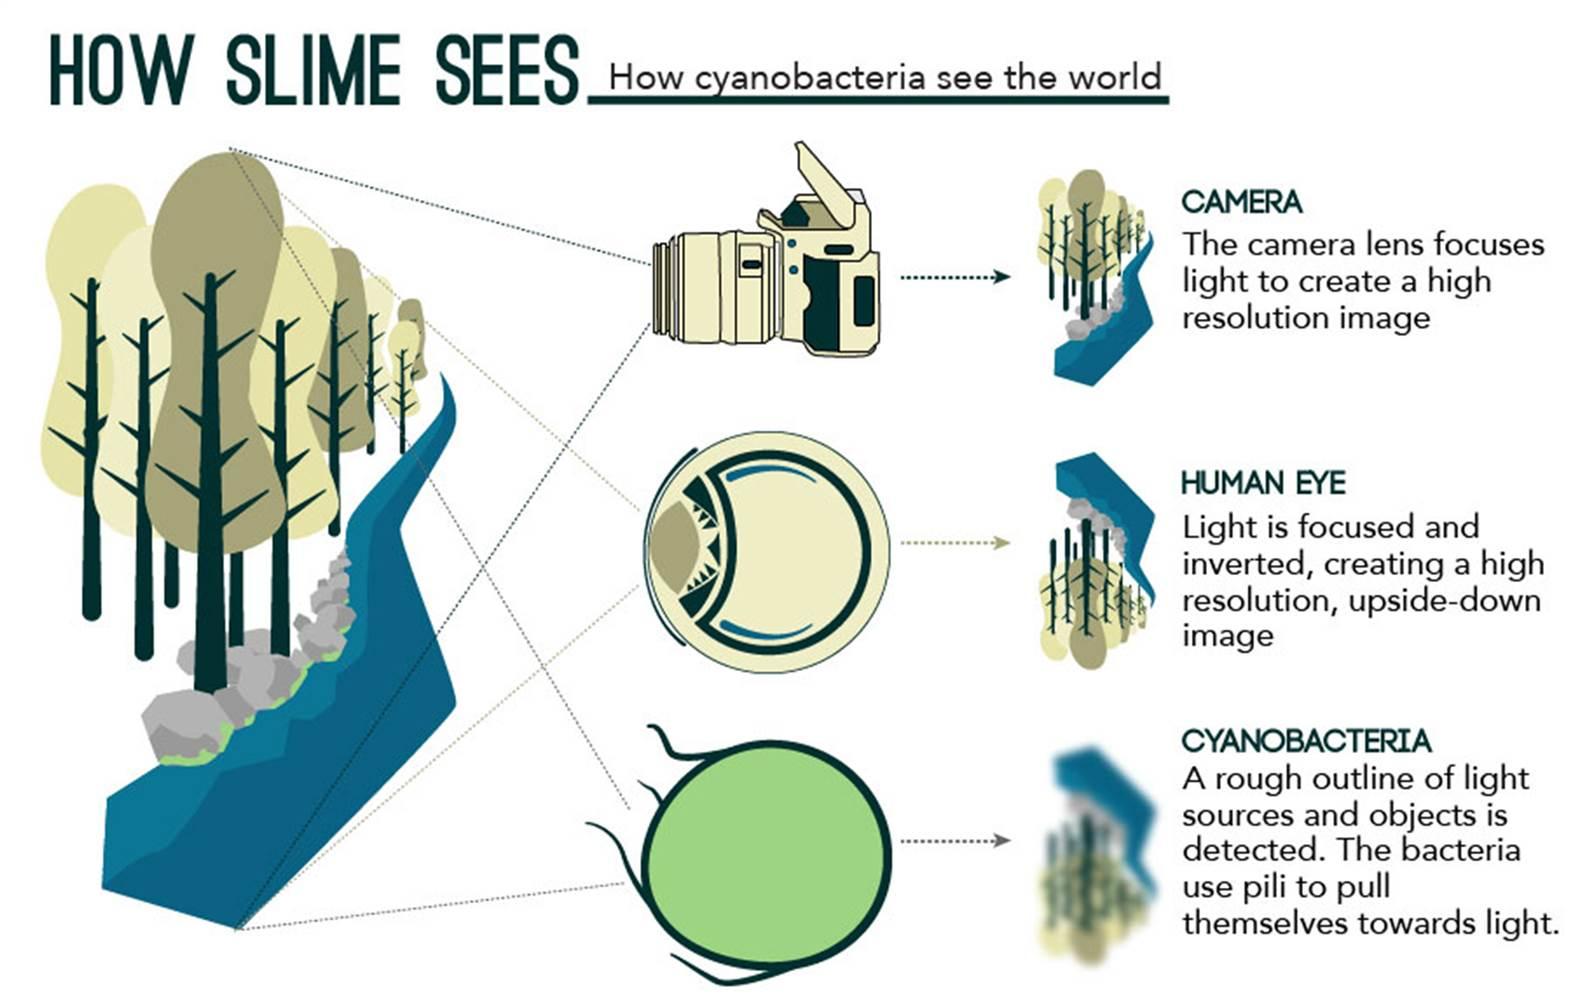 How slime sees image. Source: eLife on sciencealert.com